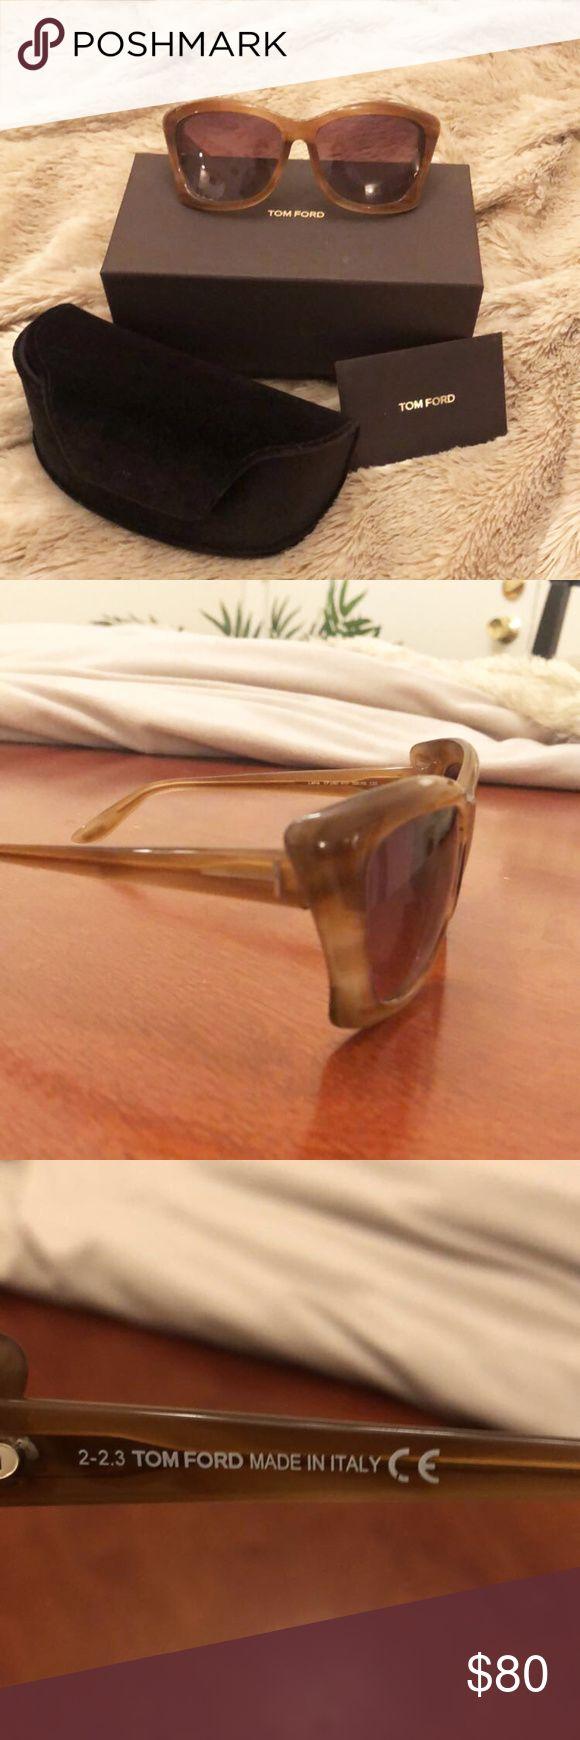 Tom Ford Lana Sunglasses